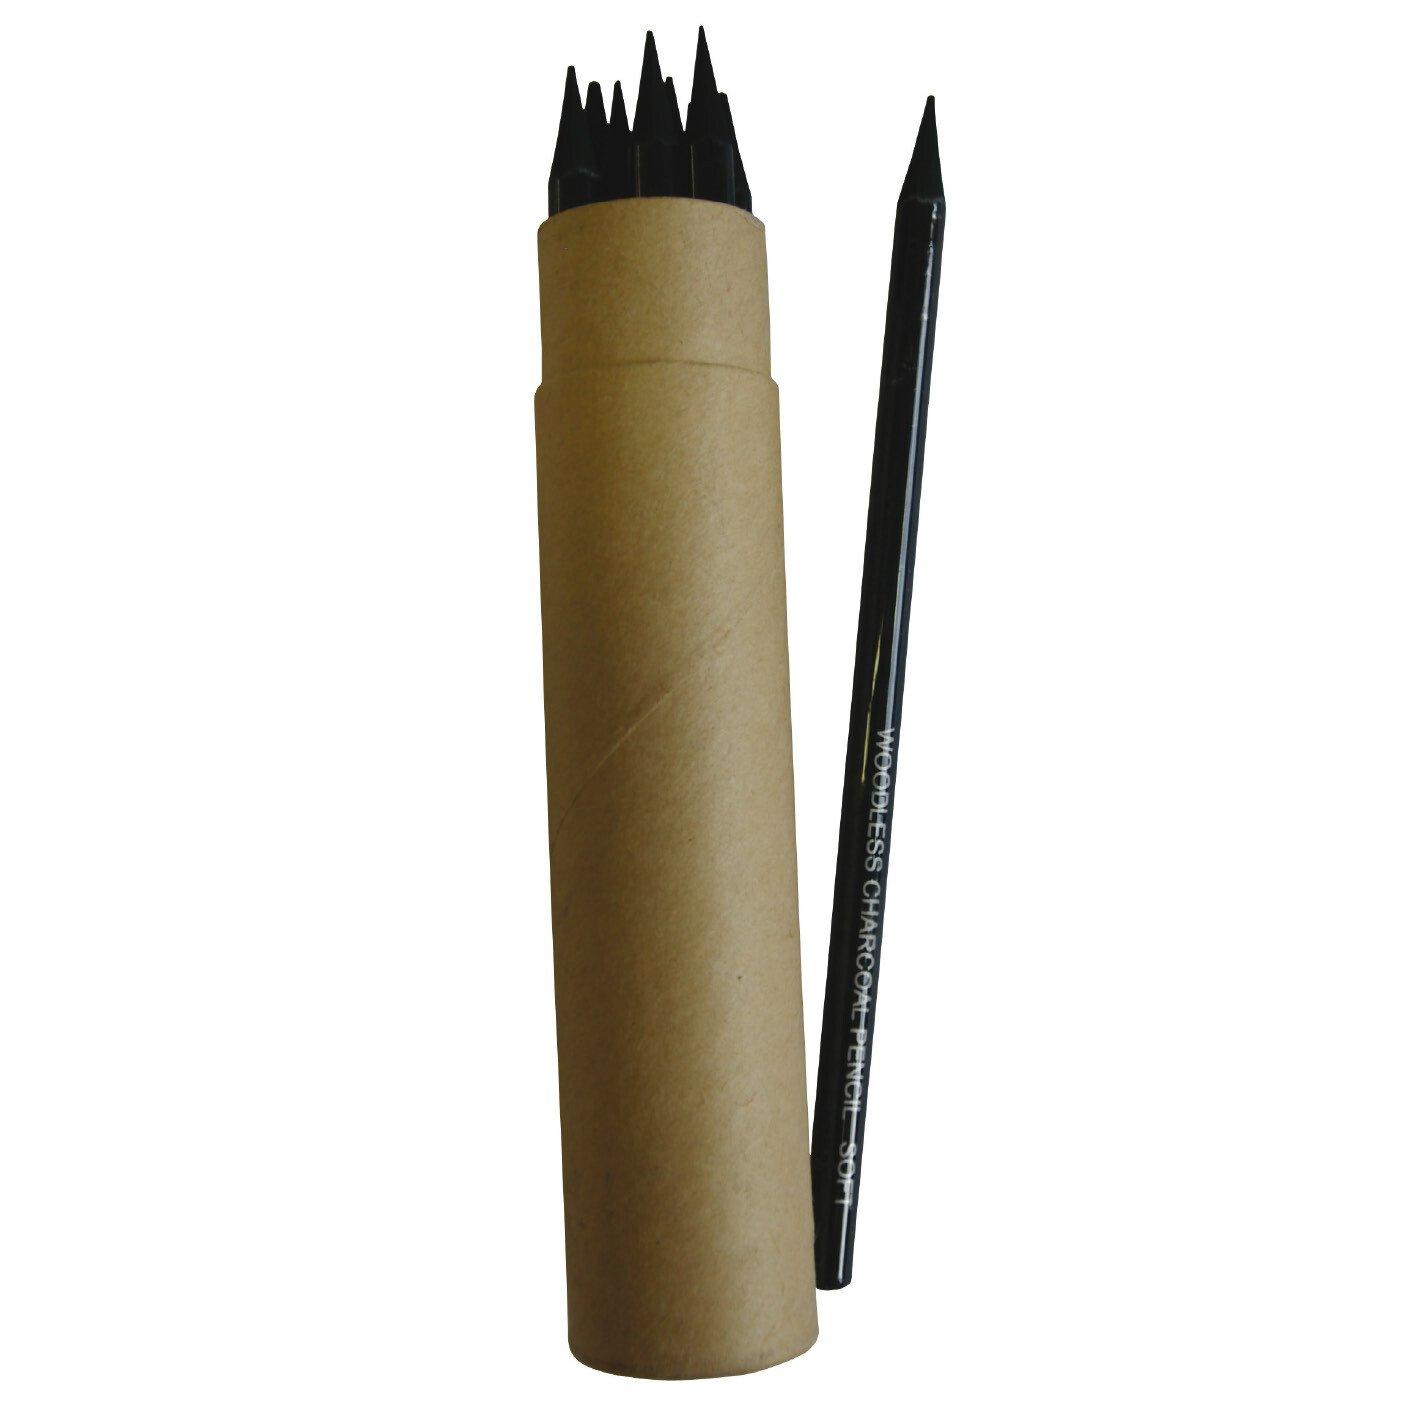 Woodless Charcoal Pencils - S&S Wholesale